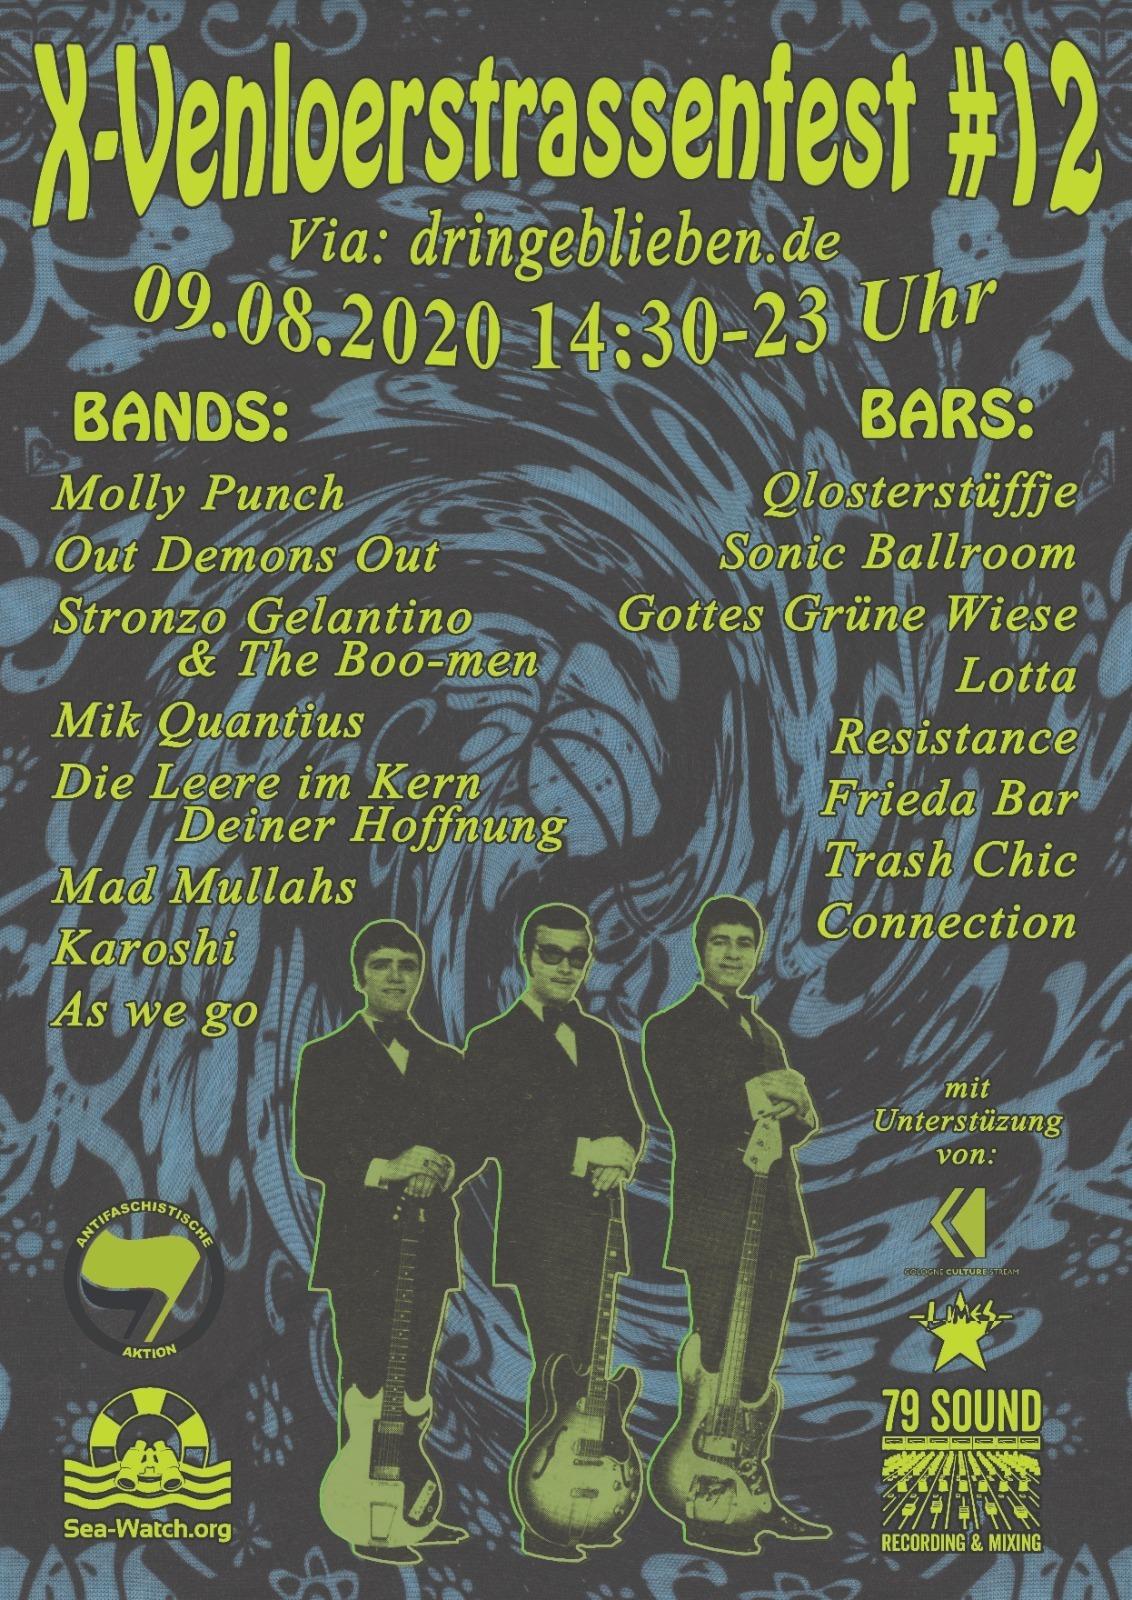 X-Venloerstrassenfest #12